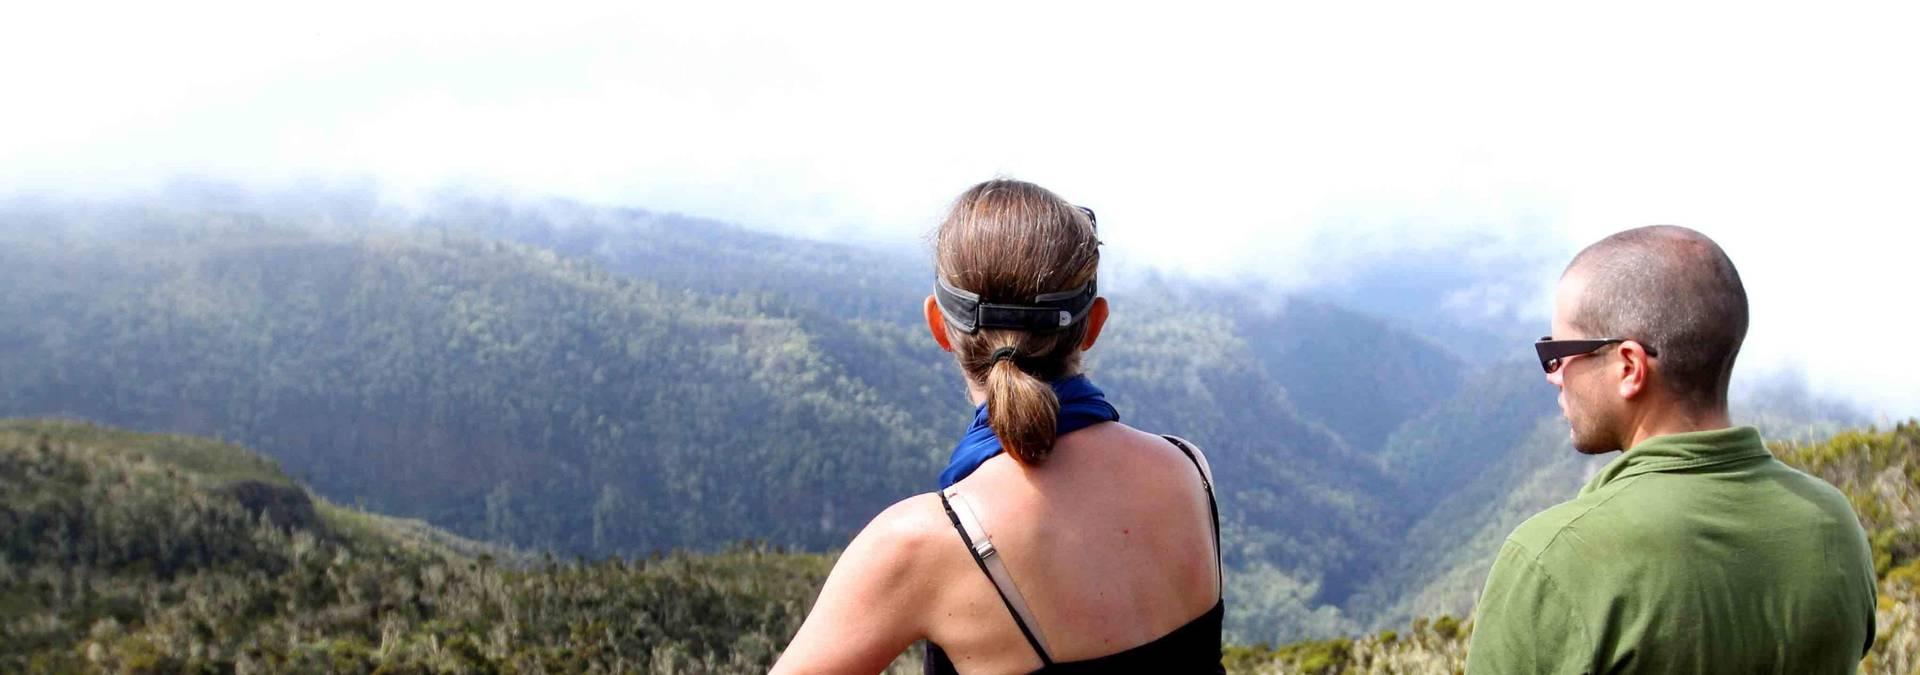 Climbing Kilimanjaro With Honey Badger (3)